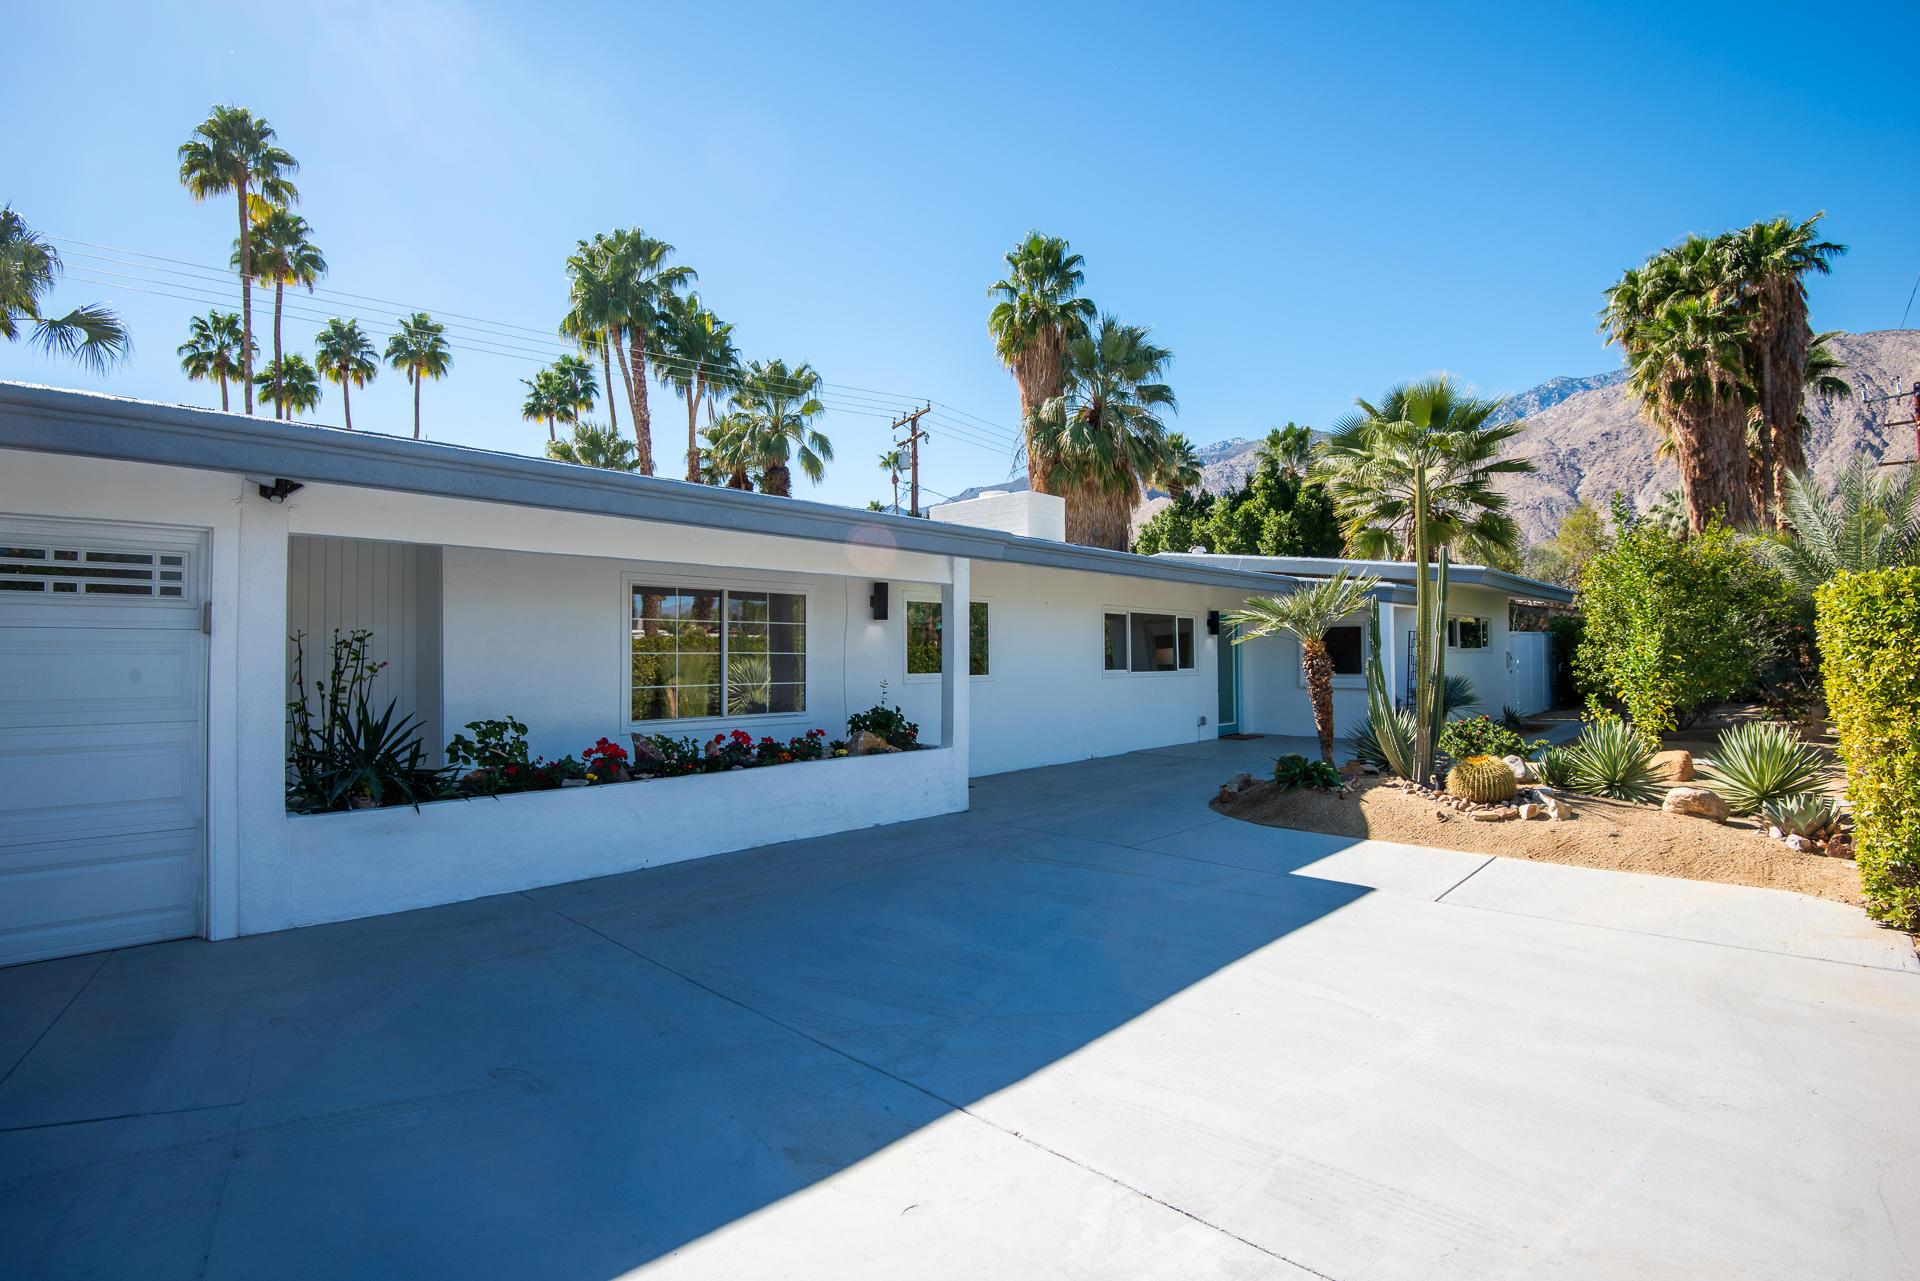 Photo of 1075 E Sunny Dunes Road, Palm Springs, CA 92264